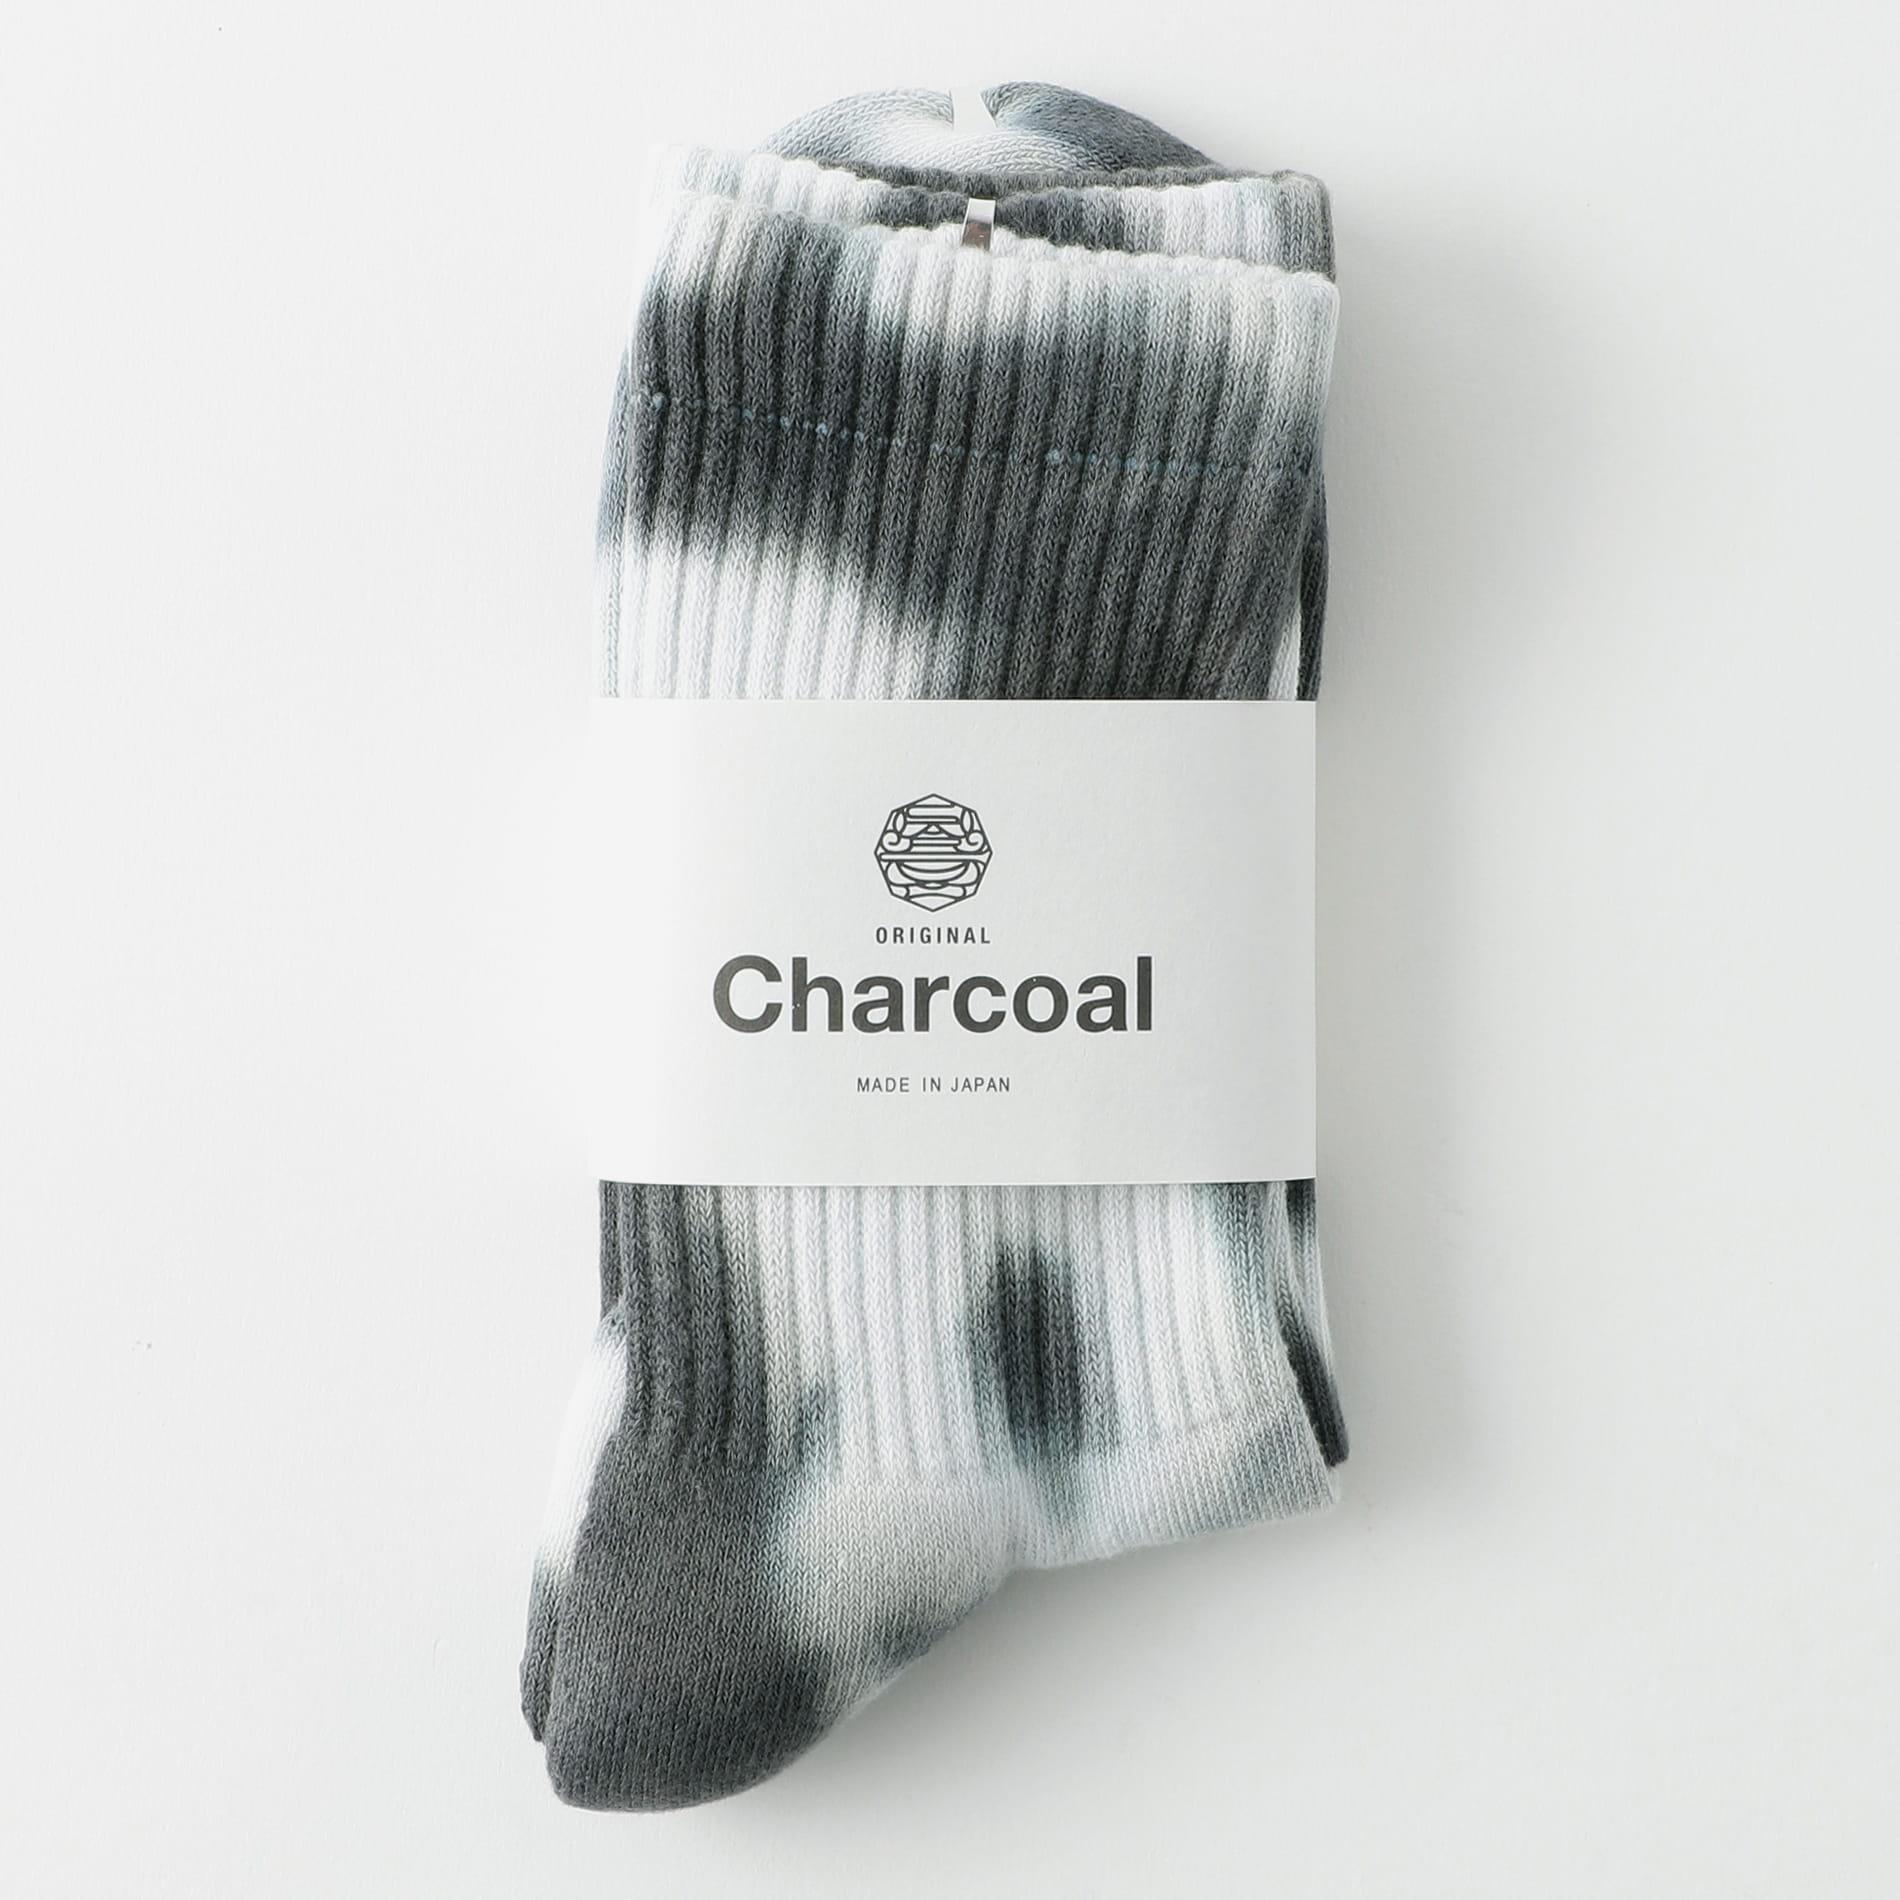 【Charcoal】MEN OC Tye-Dye Reg Socks 20-22-4-002